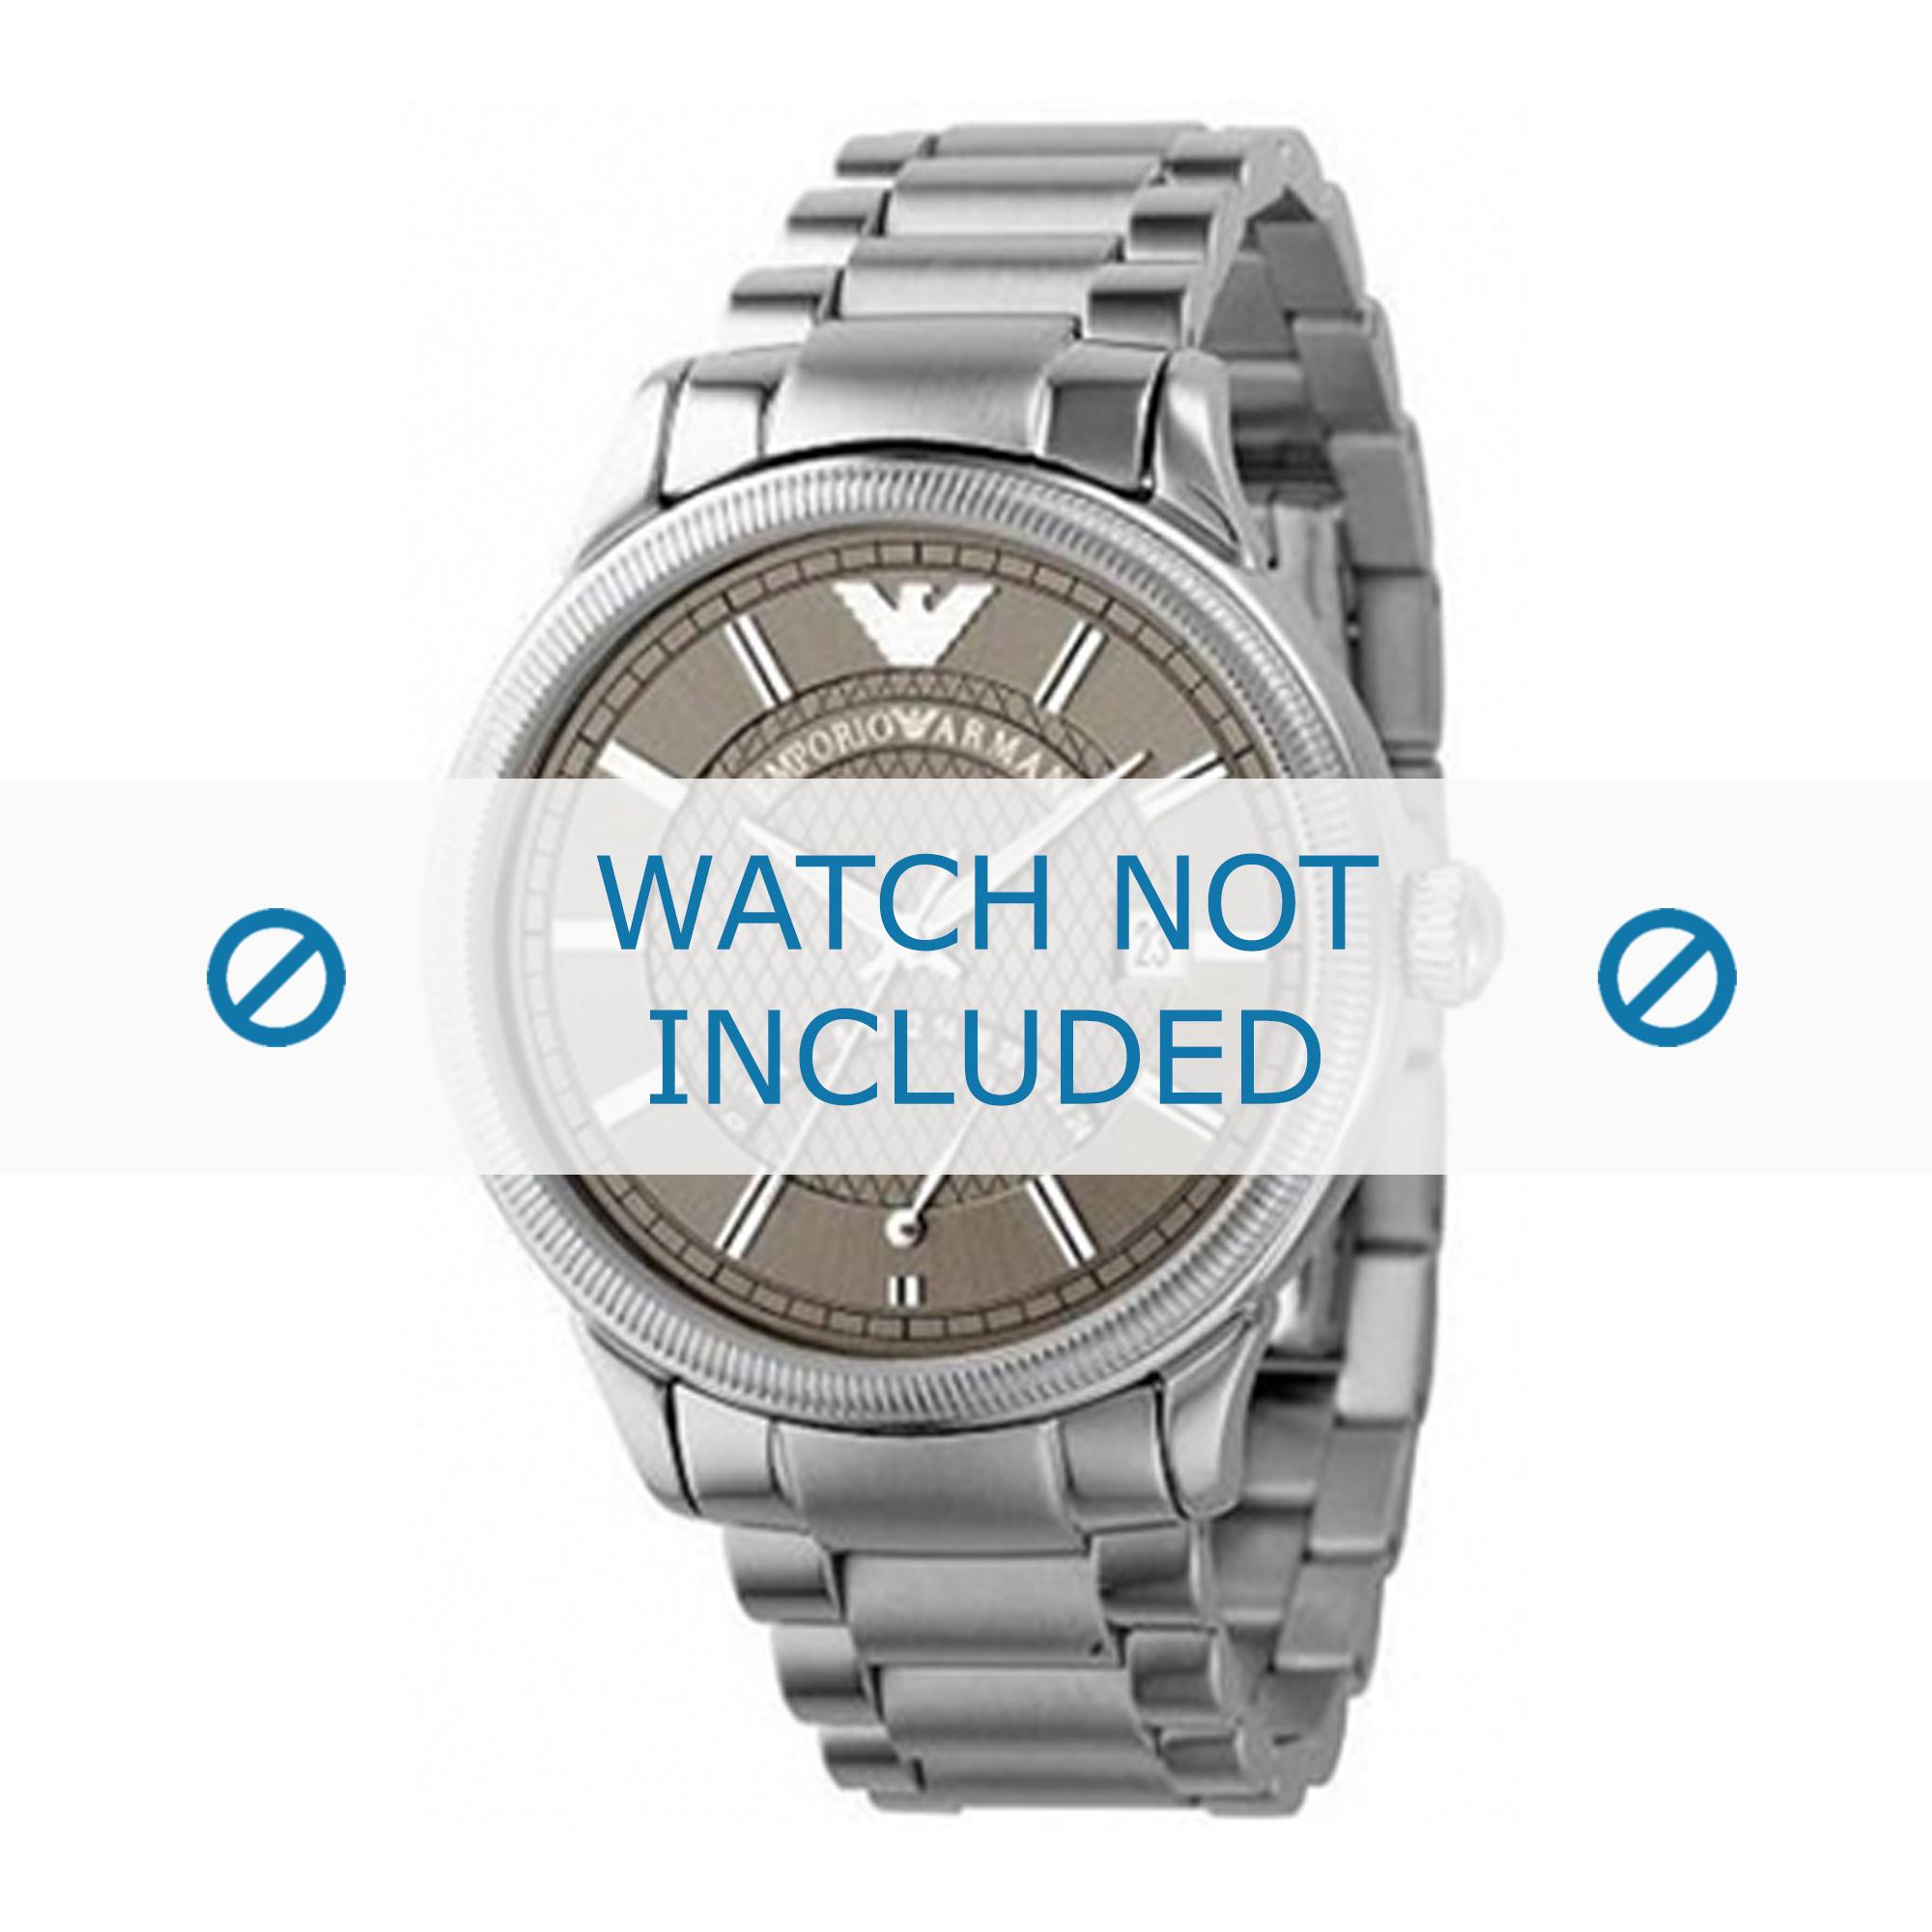 Armani klockarmband AR0563 Rostfritt stål Ilverfärgad 21mm